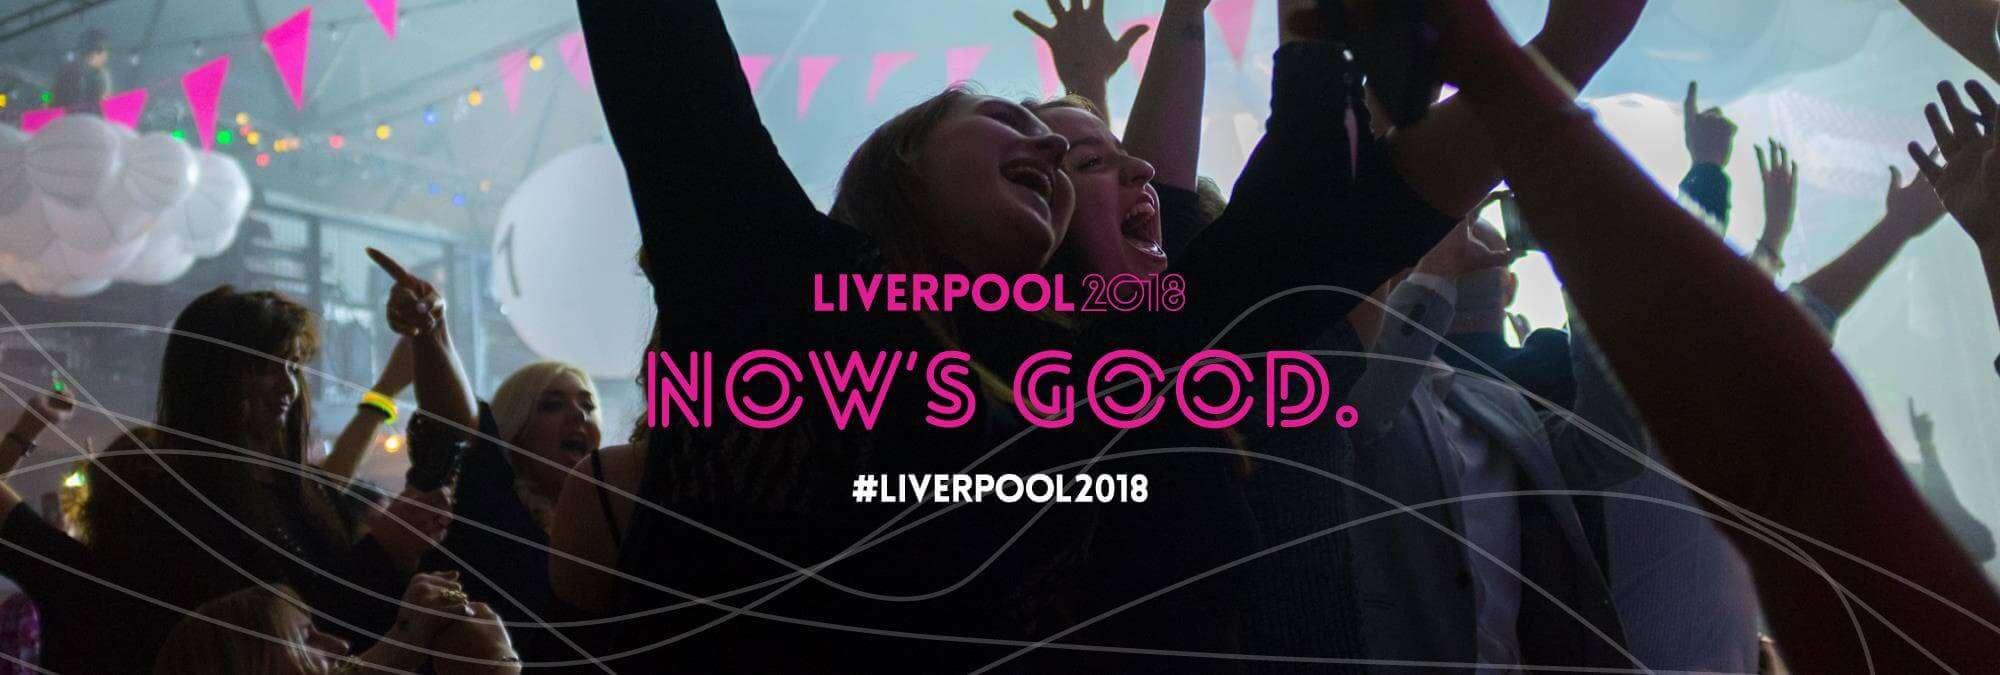 Liverpool Top Holiday Destination 2018